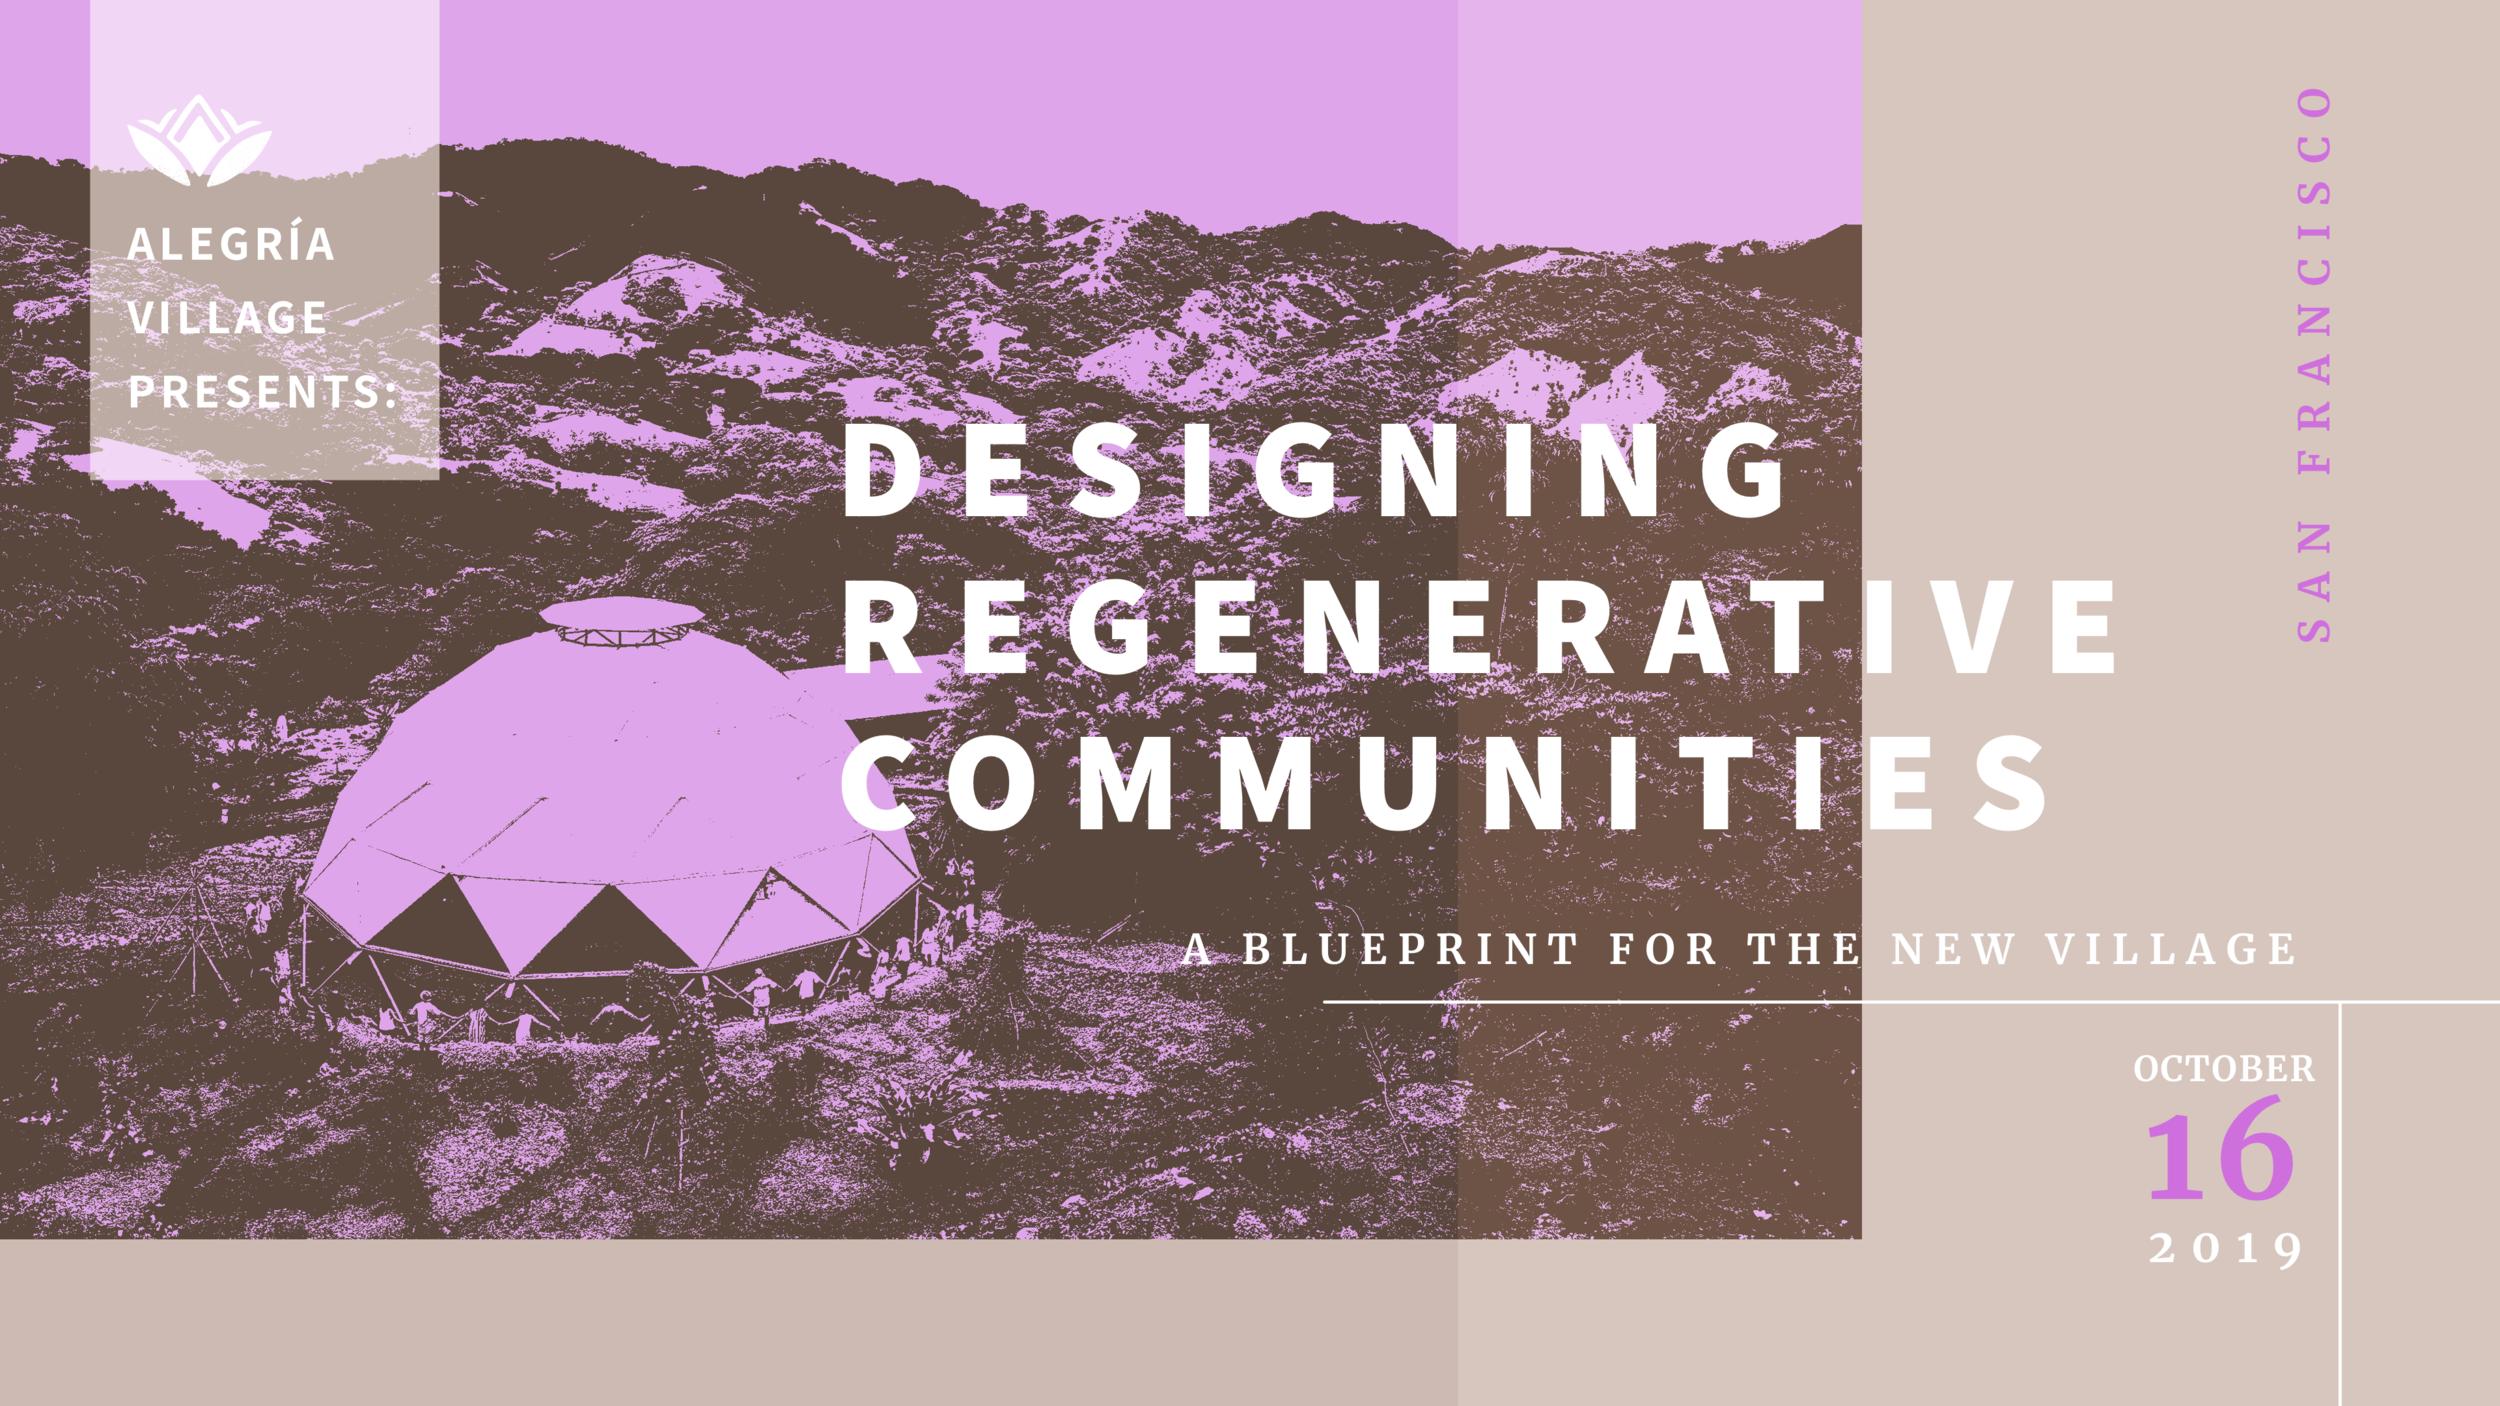 designing-regen-comm-sf-facebook copy (1).png